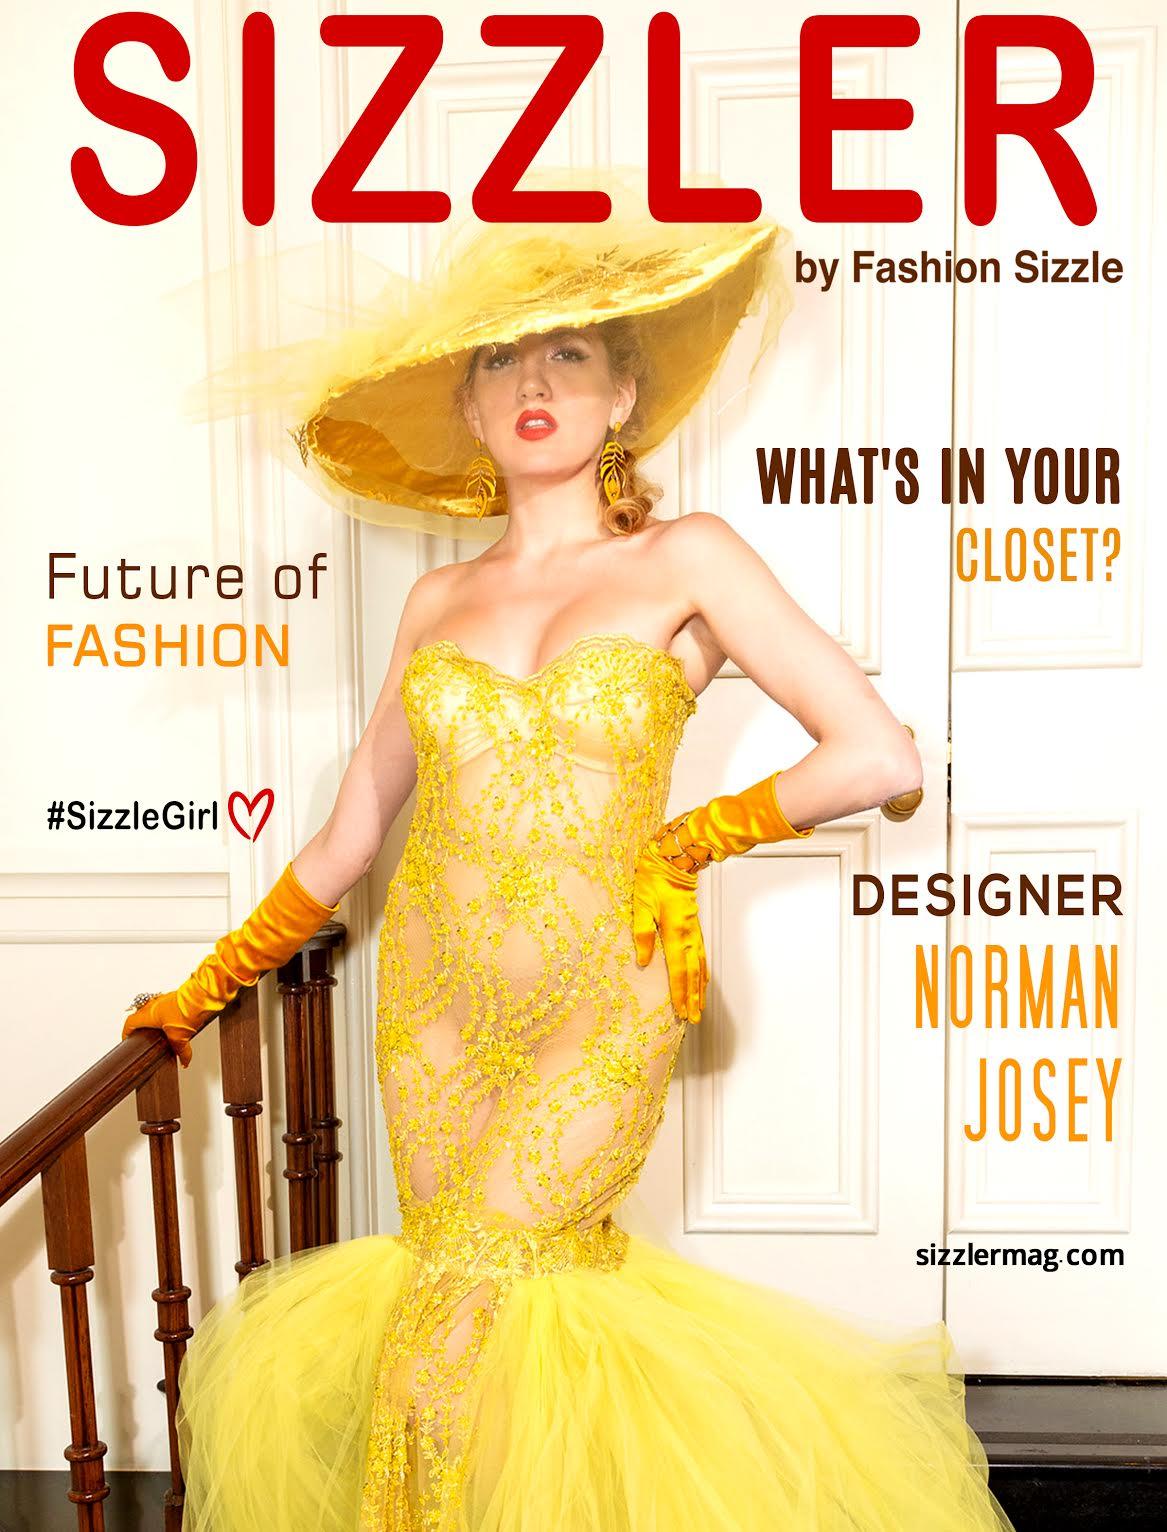 Sizzler Magazine A Digital Fashion & Lifestyle Magazine Launches By Fashion Sizzle